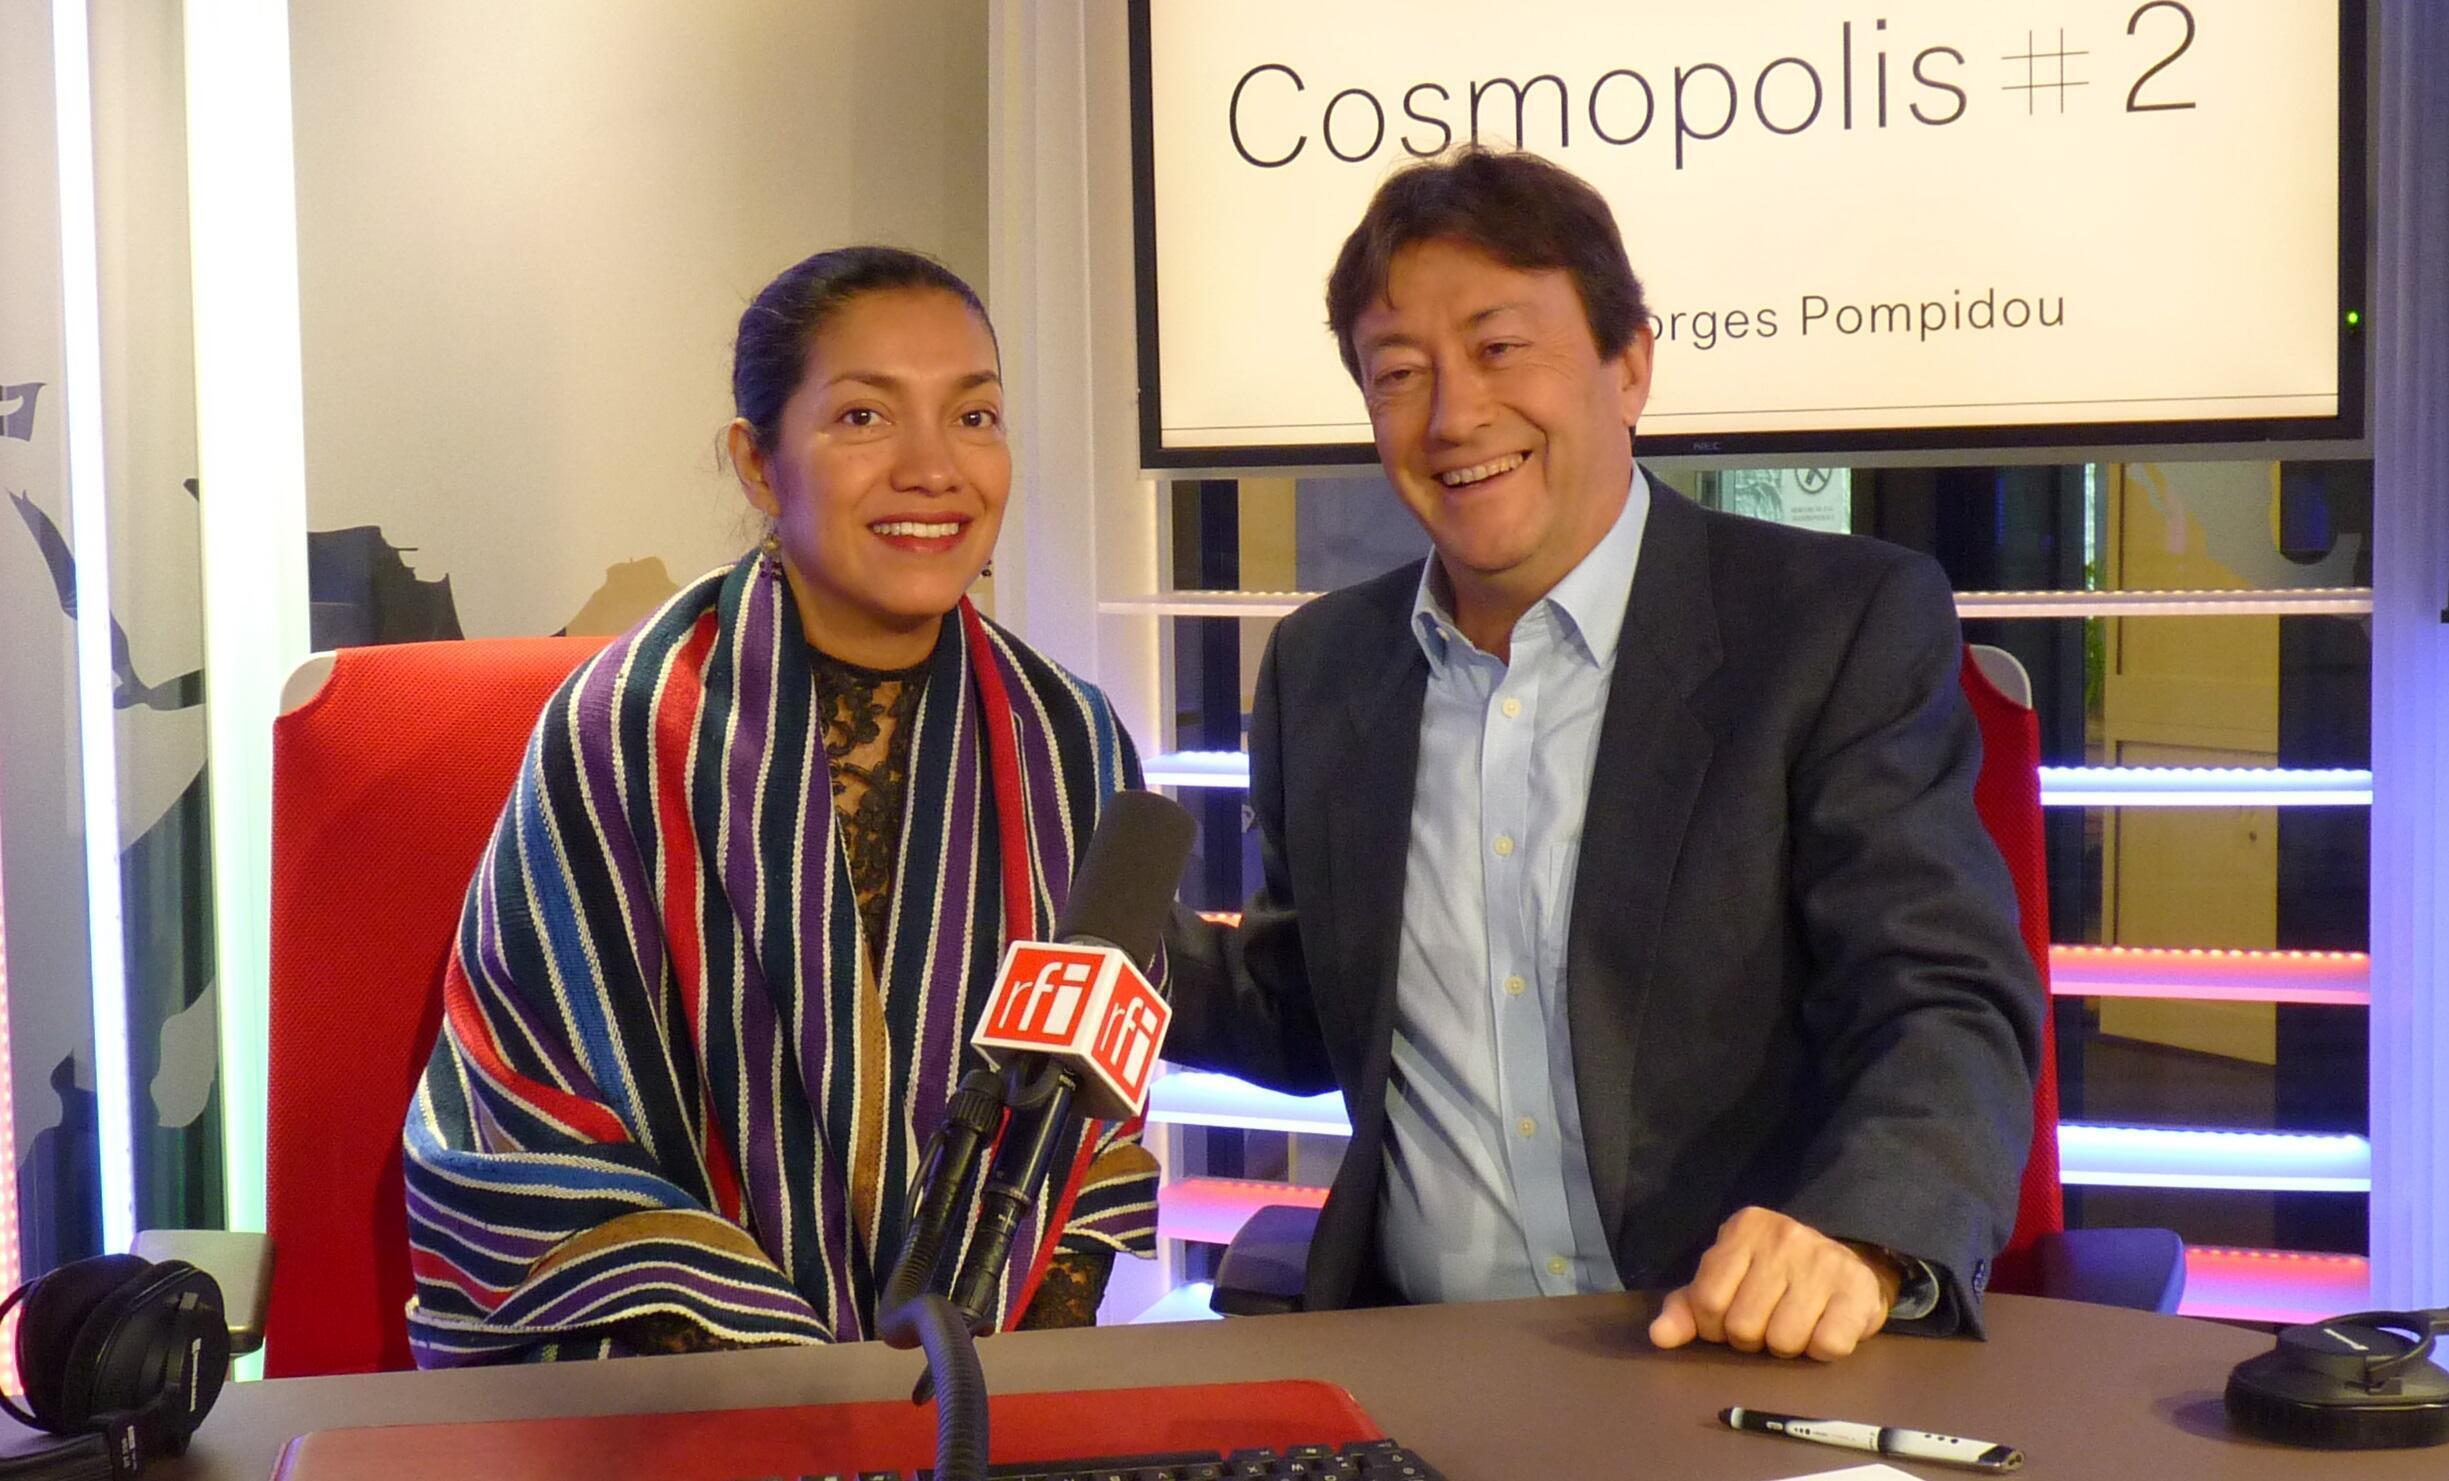 Sandra Monterroso con Jordi Batallé en el estudio 151 de RFI